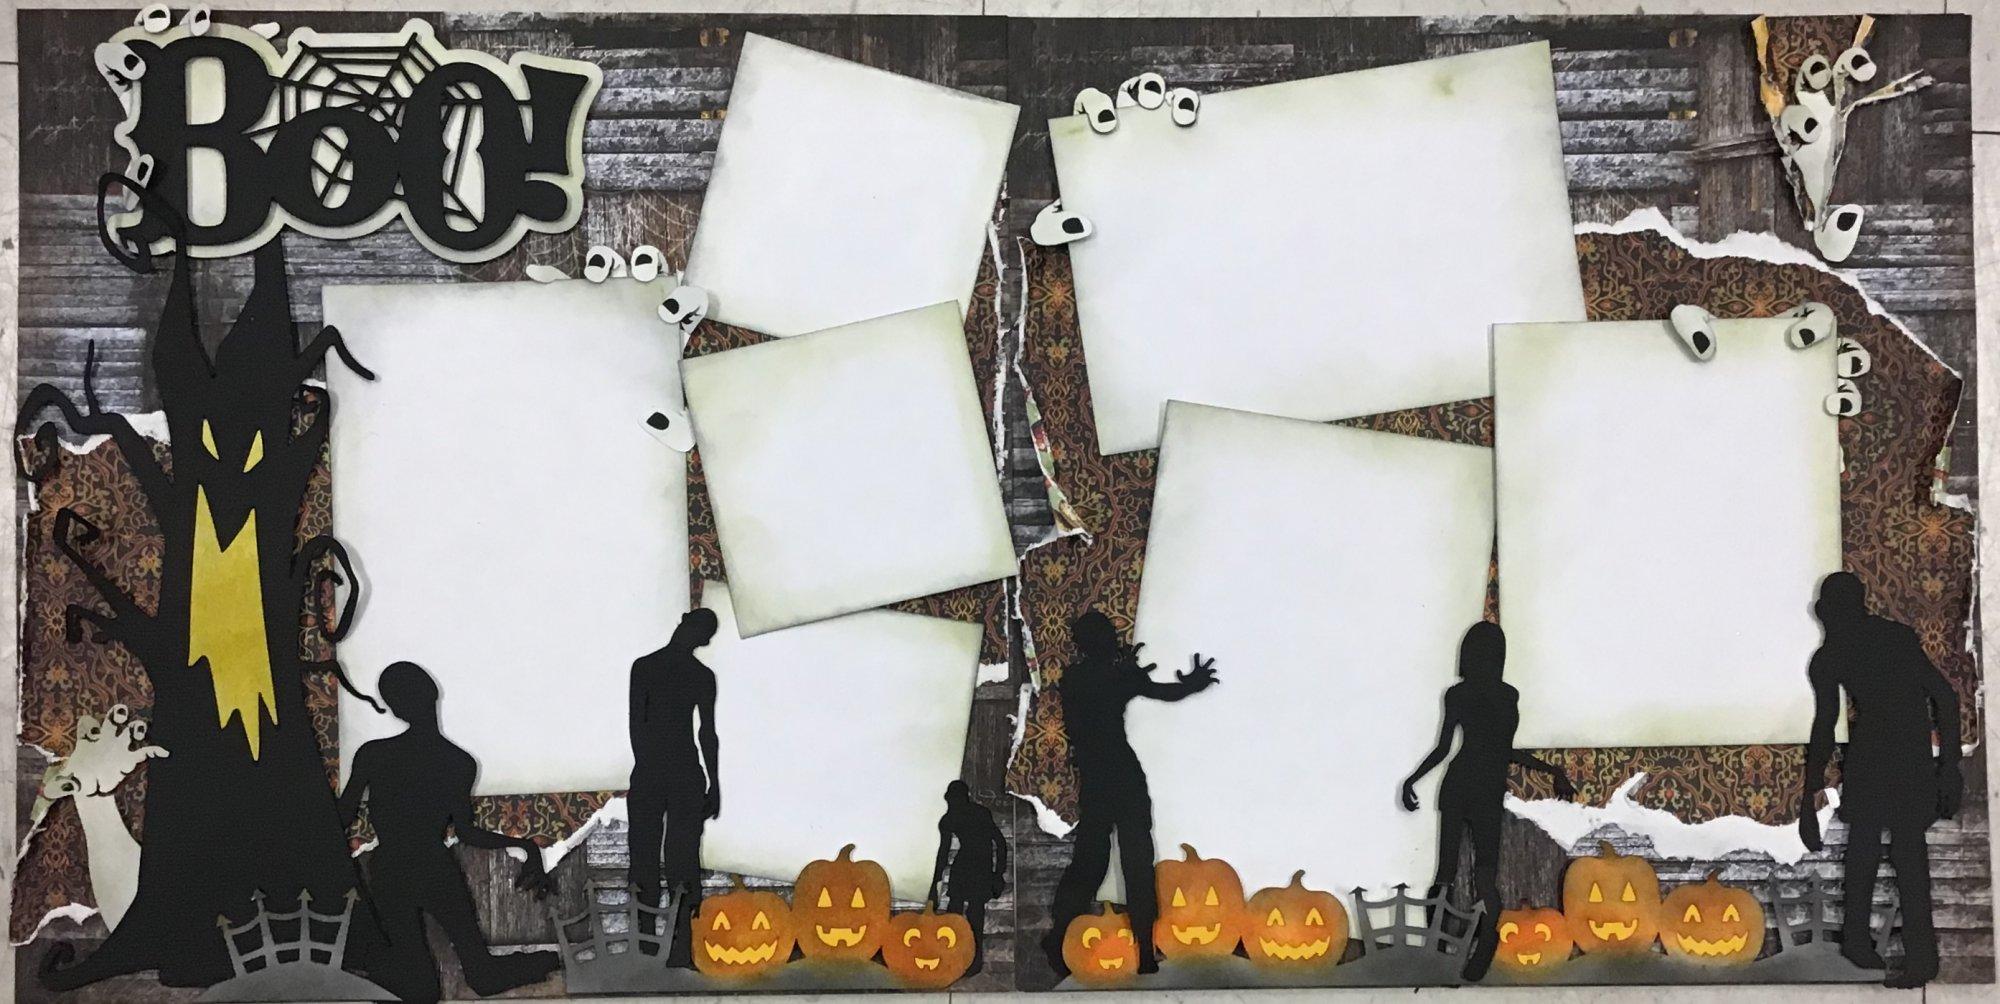 Boo Halloween 12x12 Layout  - copy